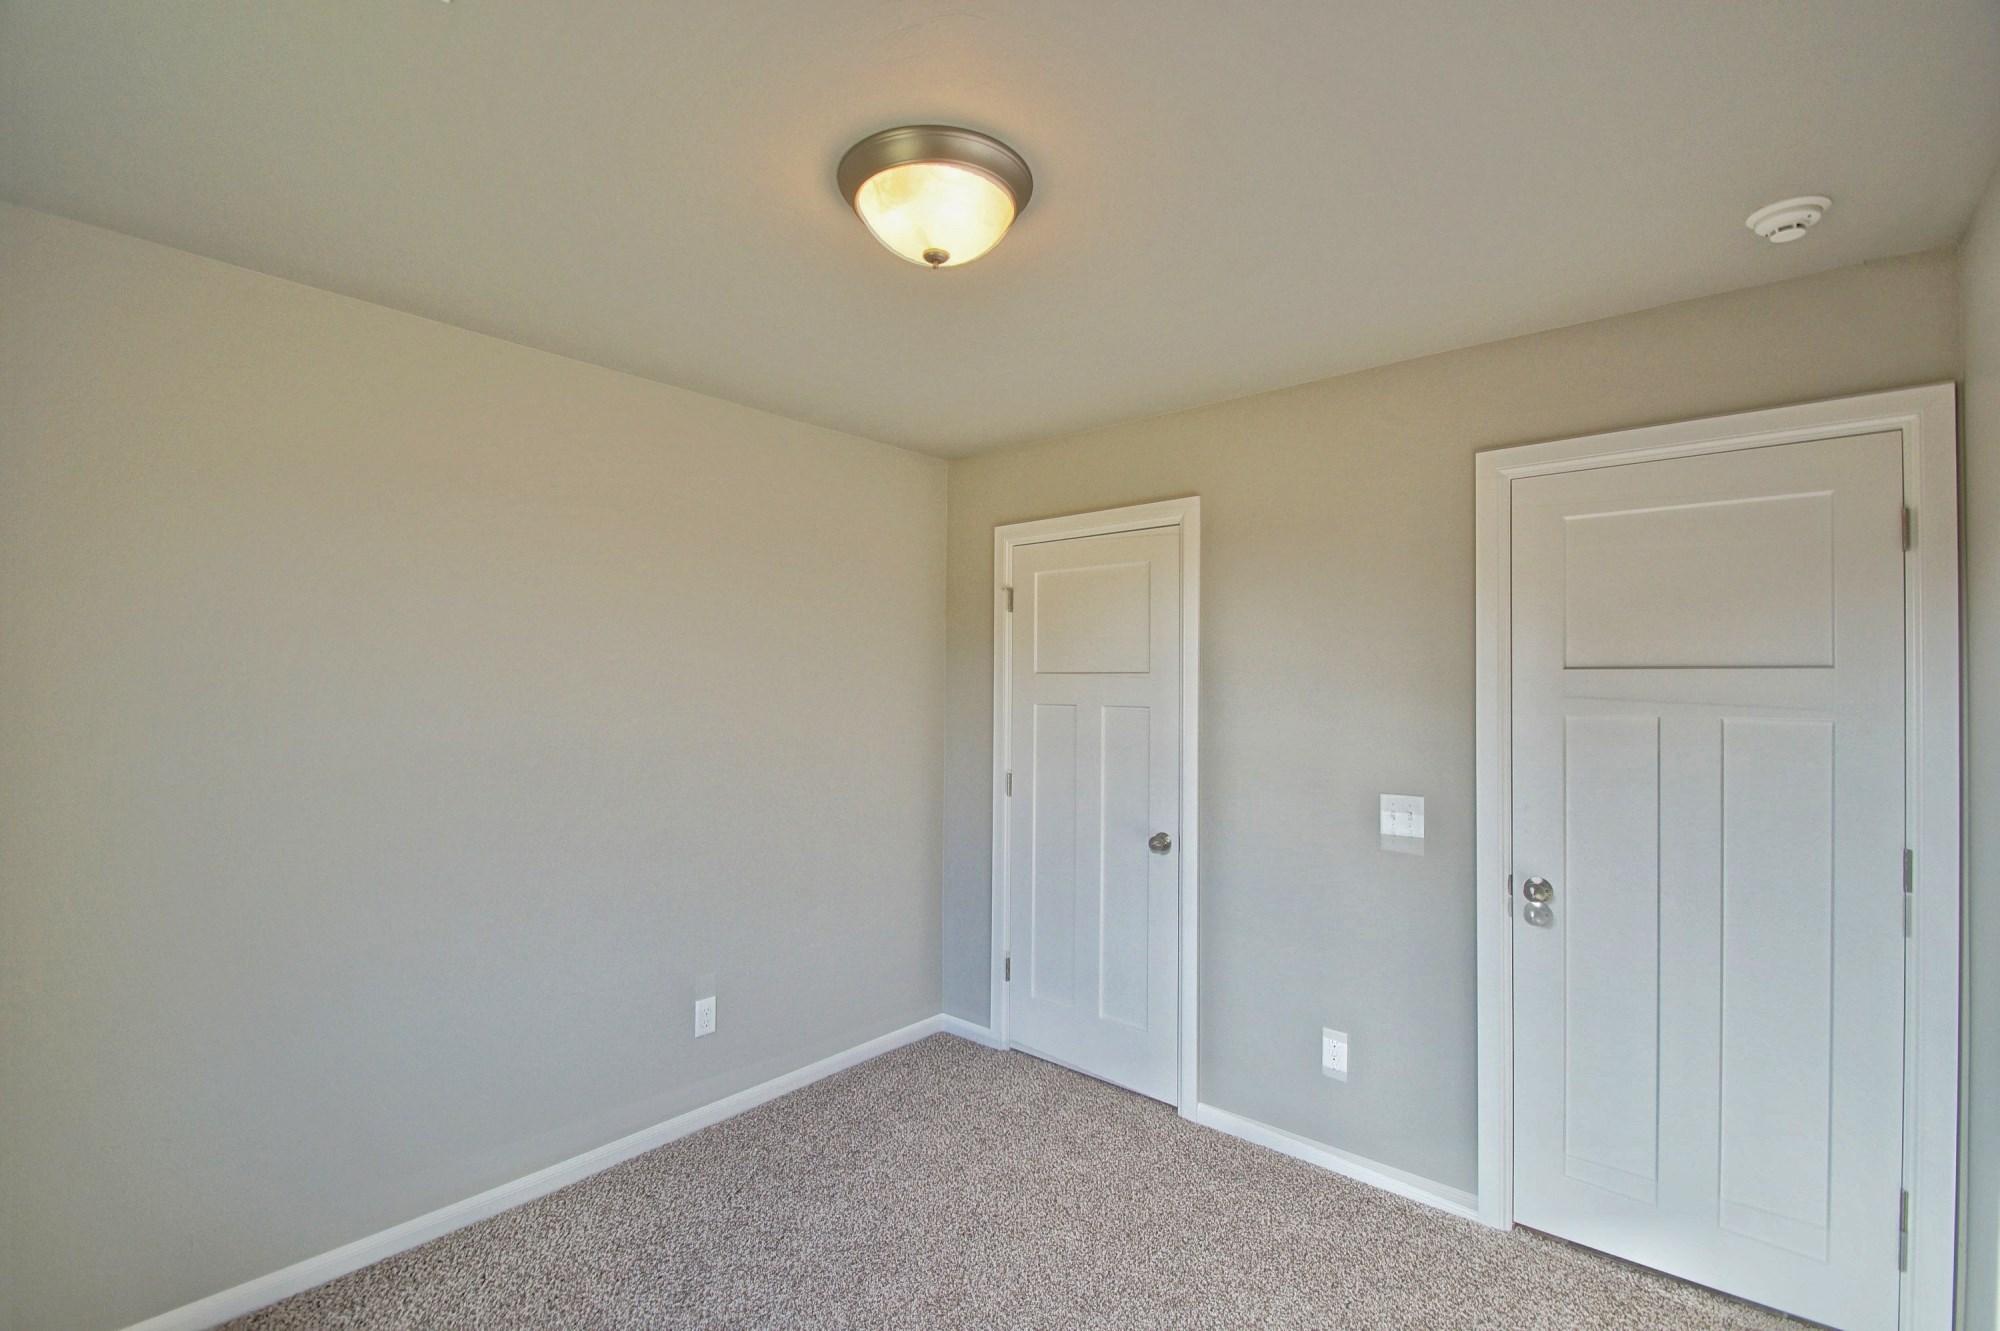 22 - Bedroom.jpg